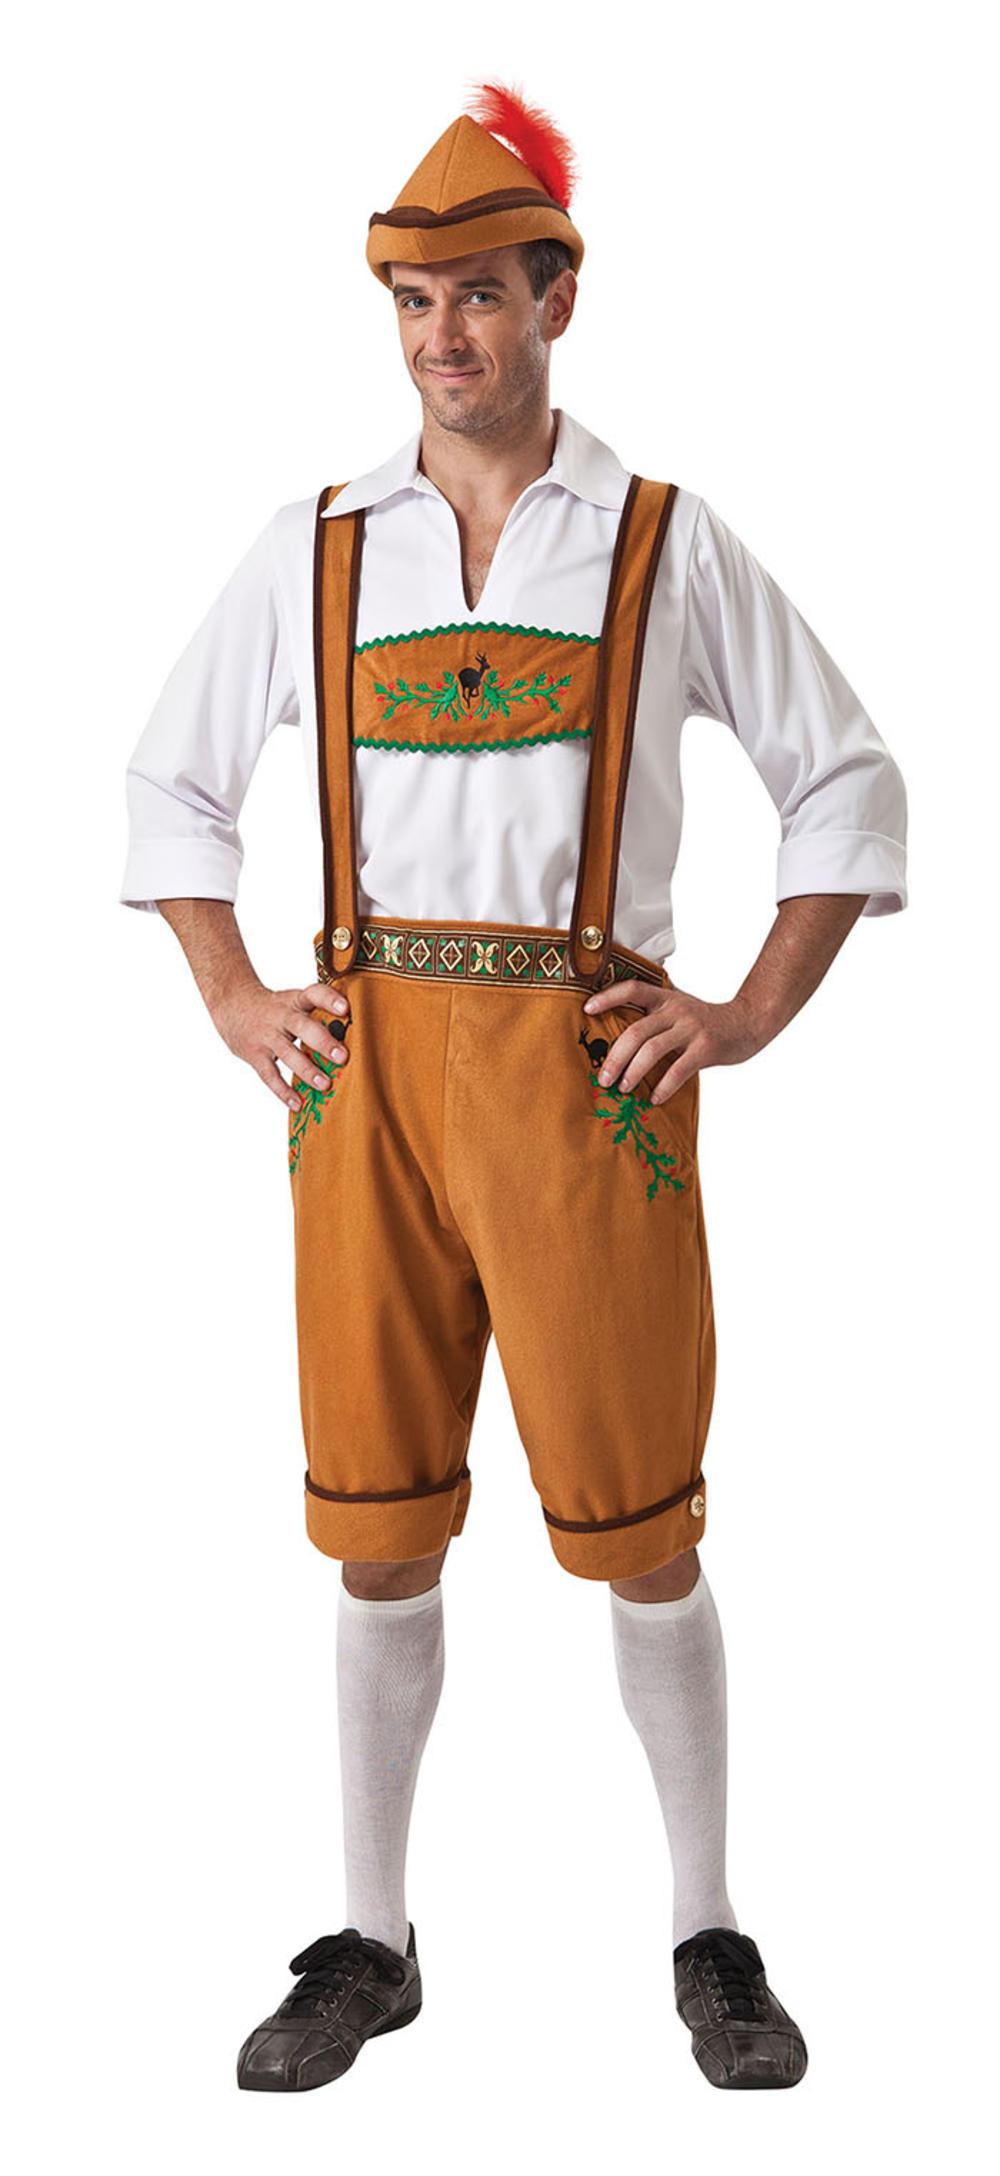 Oktoberfest Country Man Costume